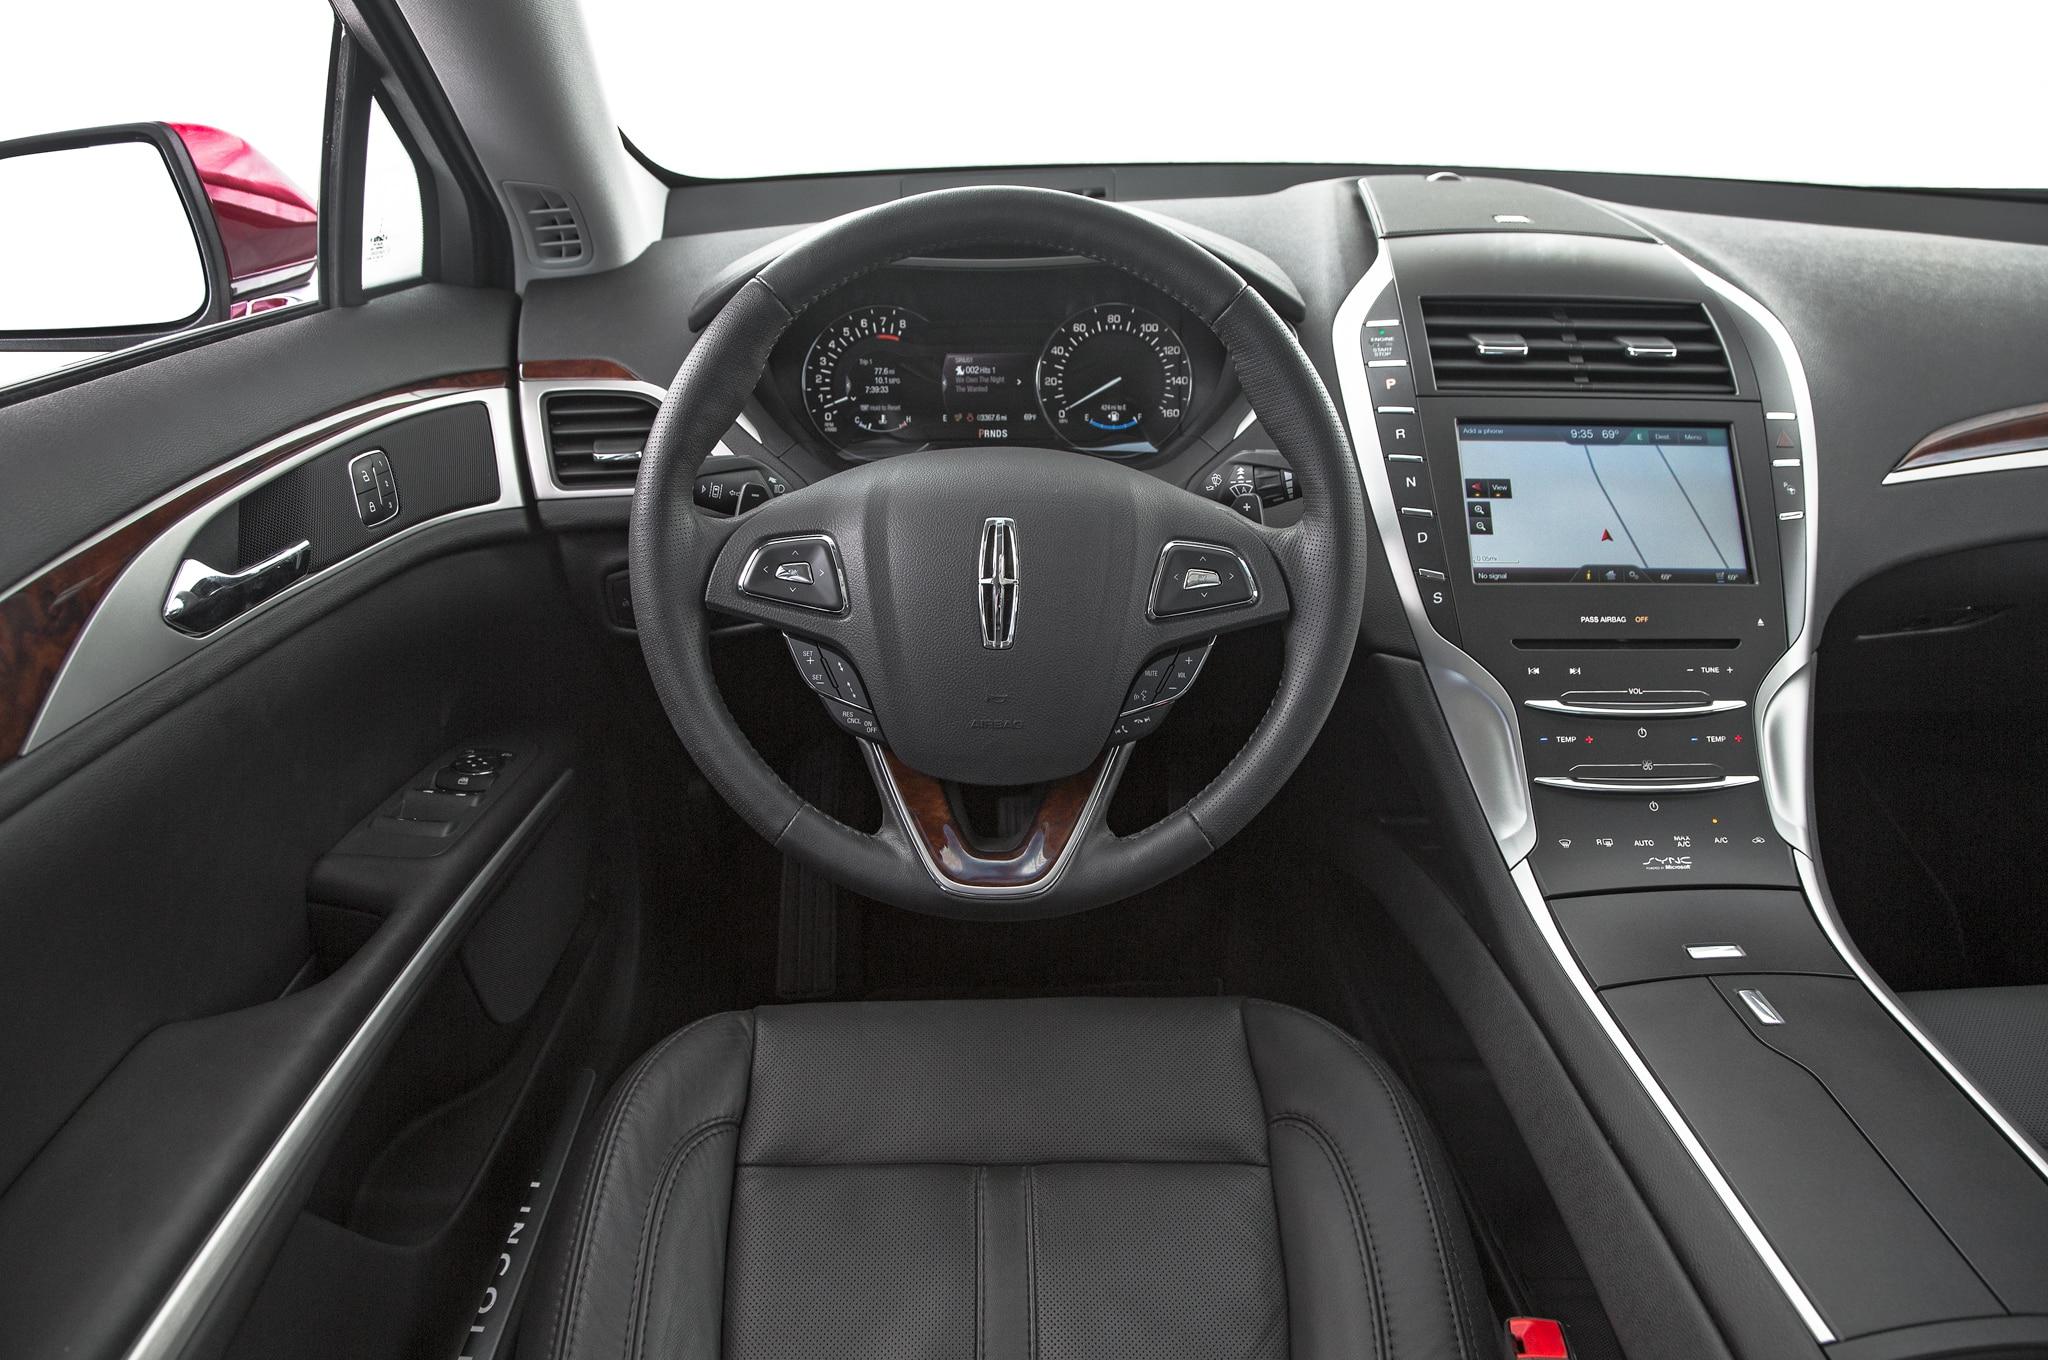 2013 Lincoln Mkz Hybrid First Drive Automobile Magazine